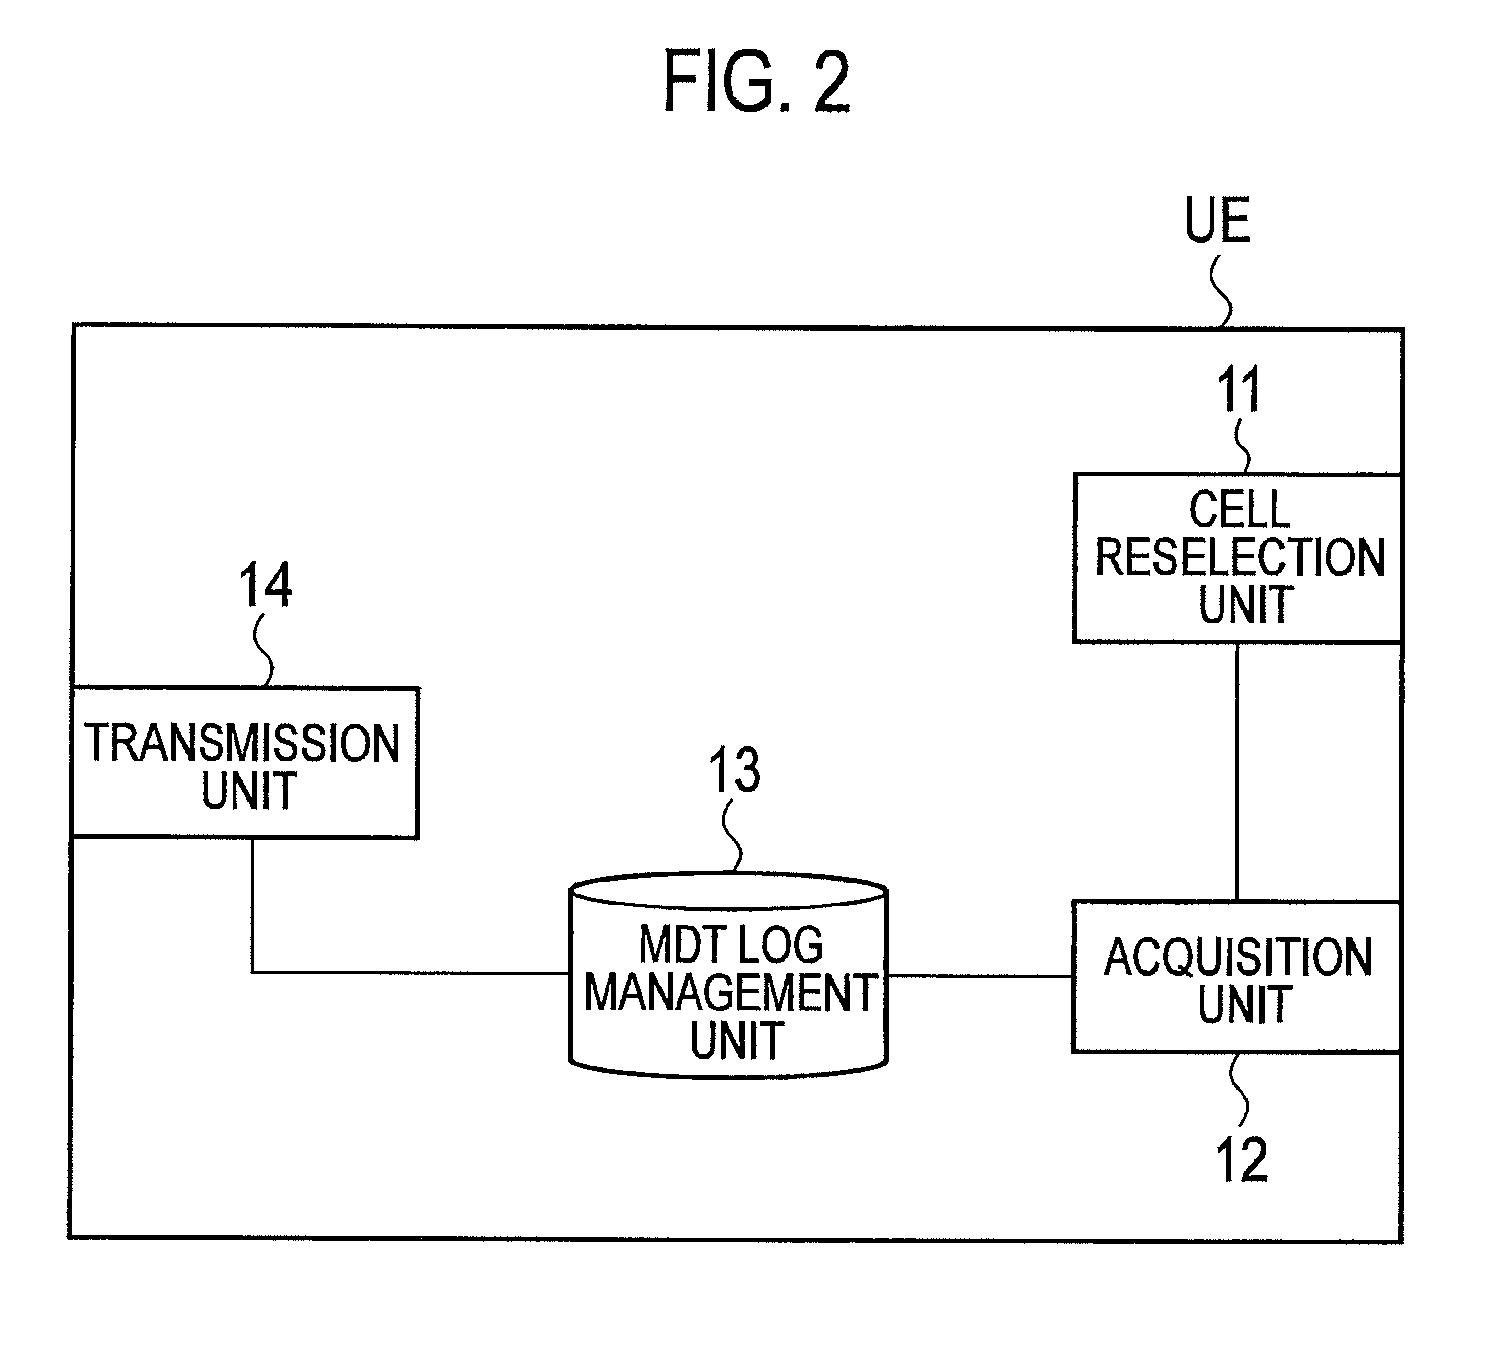 Patent US 9,271,162 B2